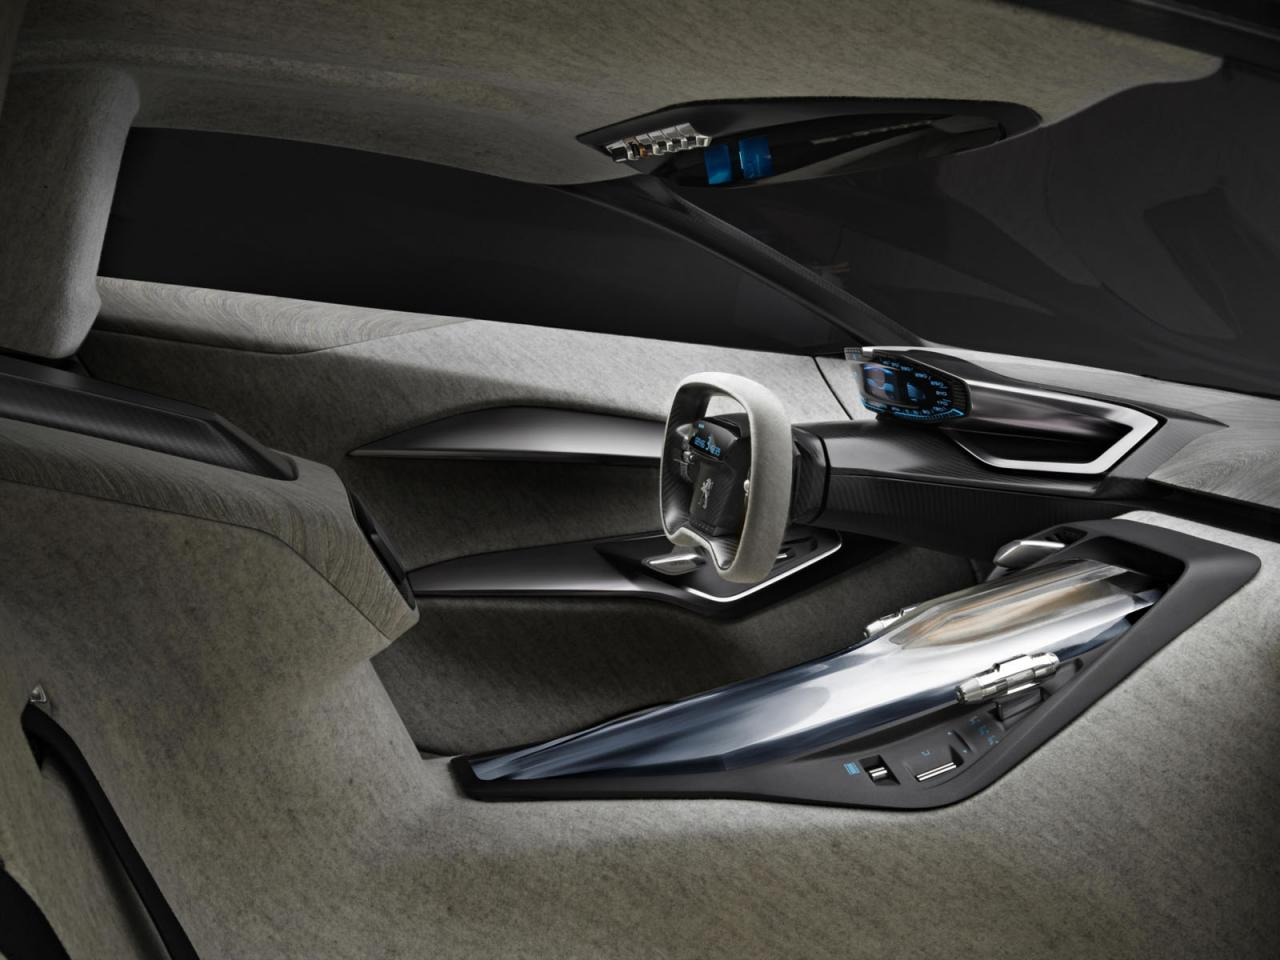 [Resim: Peugeot+Onyx+3.jpg]